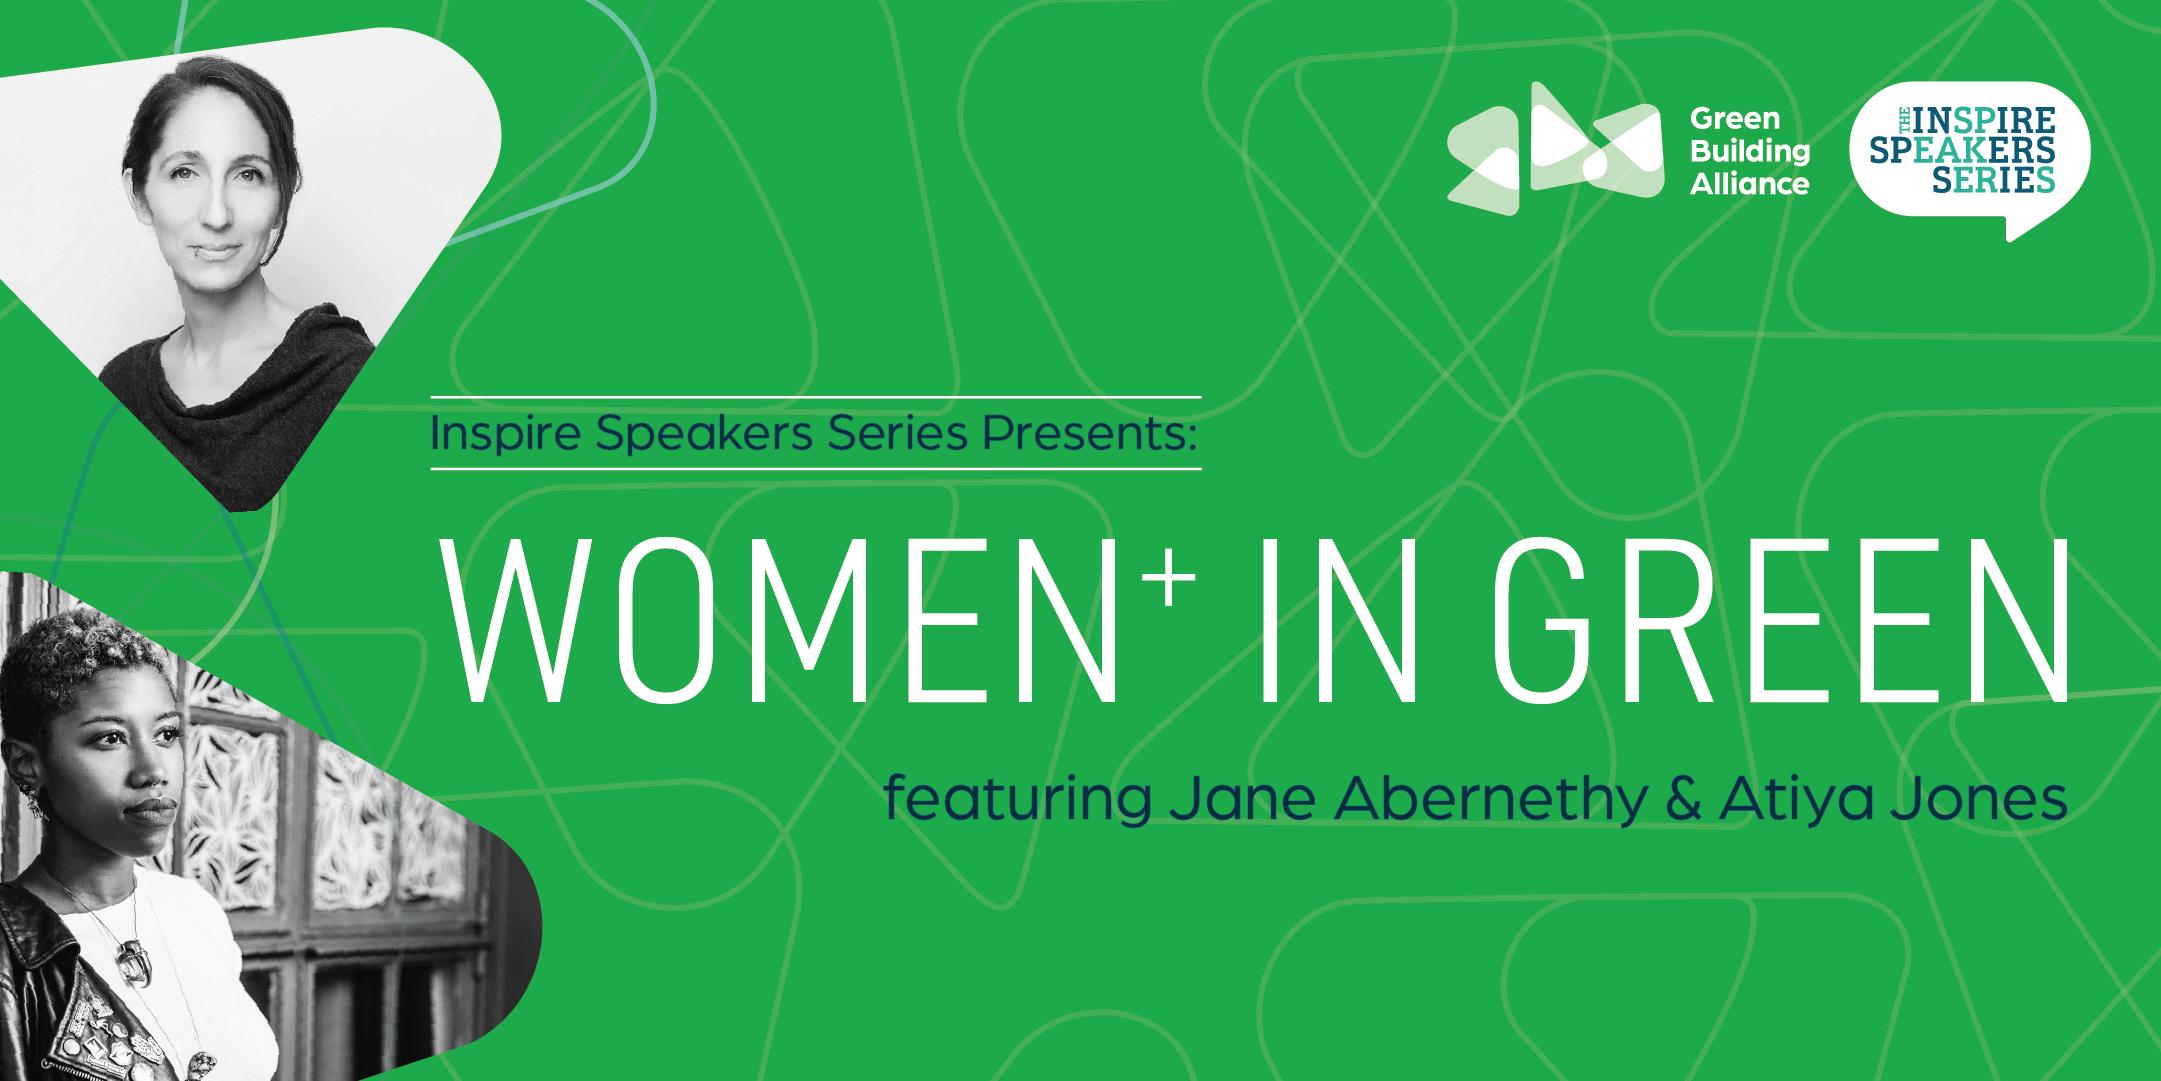 Green Building Alliance Women in Green Inspire Speakers Series